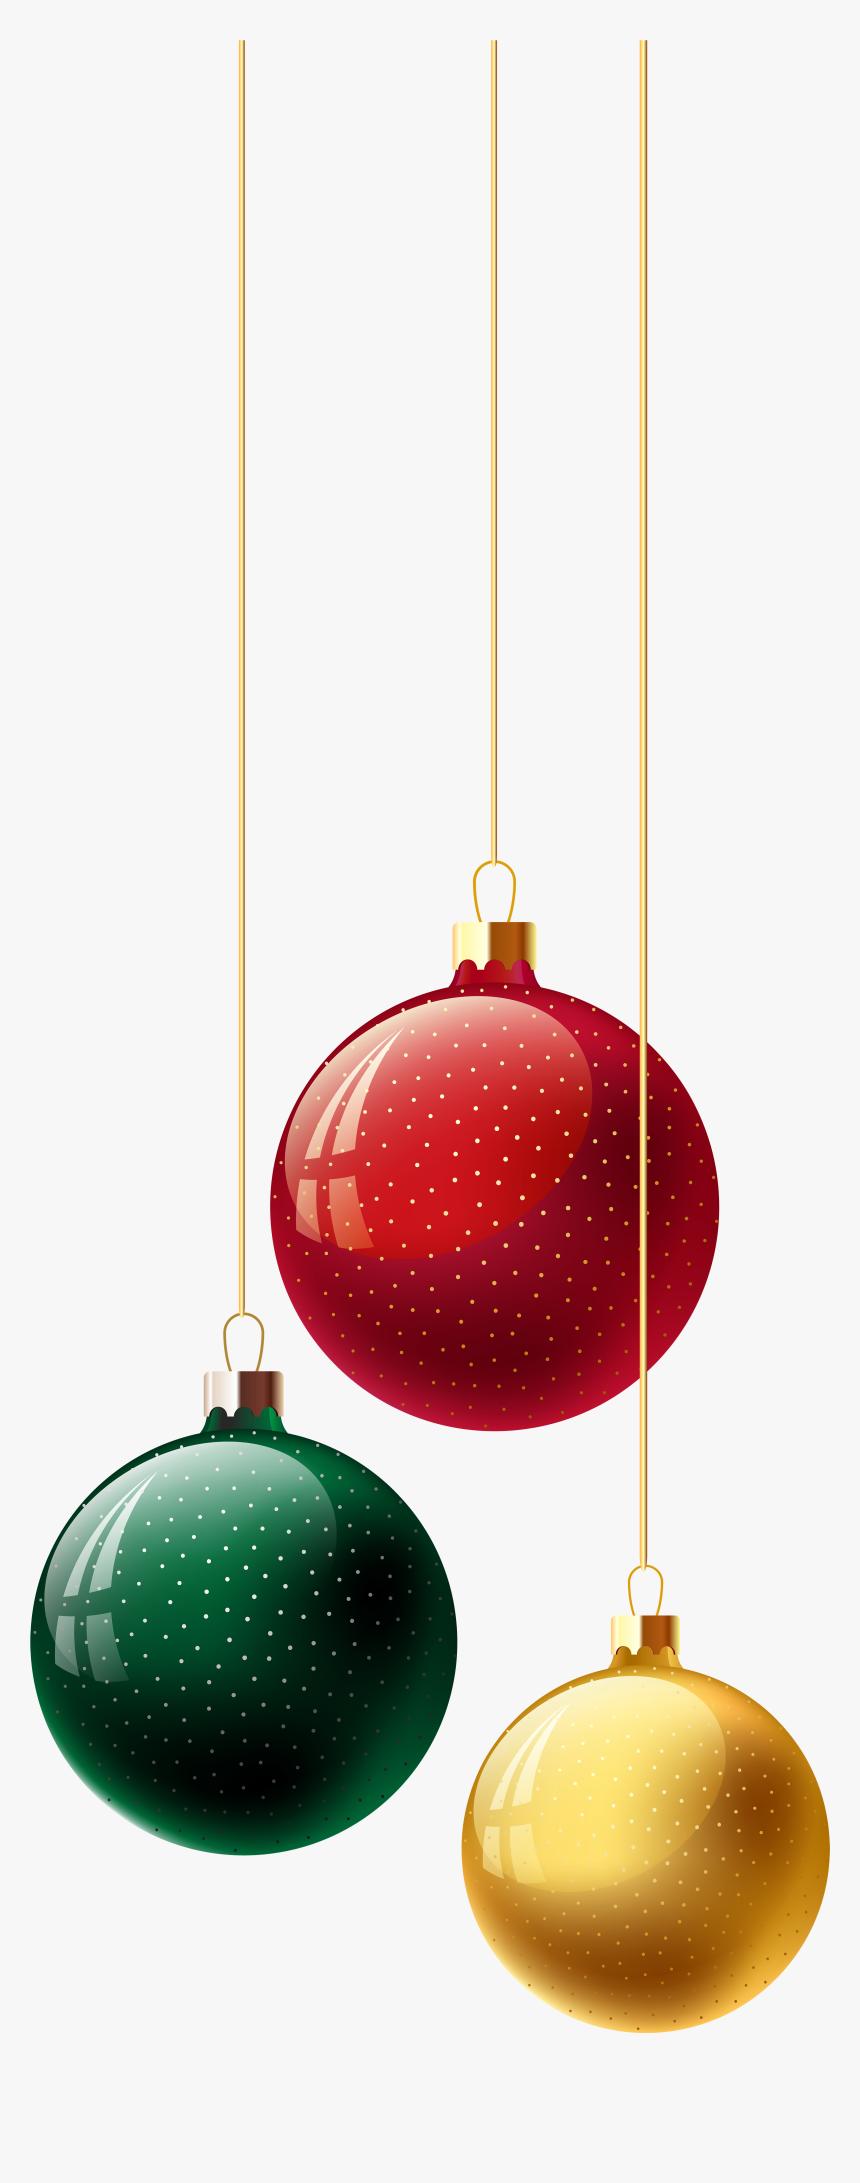 Clip Art Enfeite Design Produto Bolas   Bolas De Natal Png ...